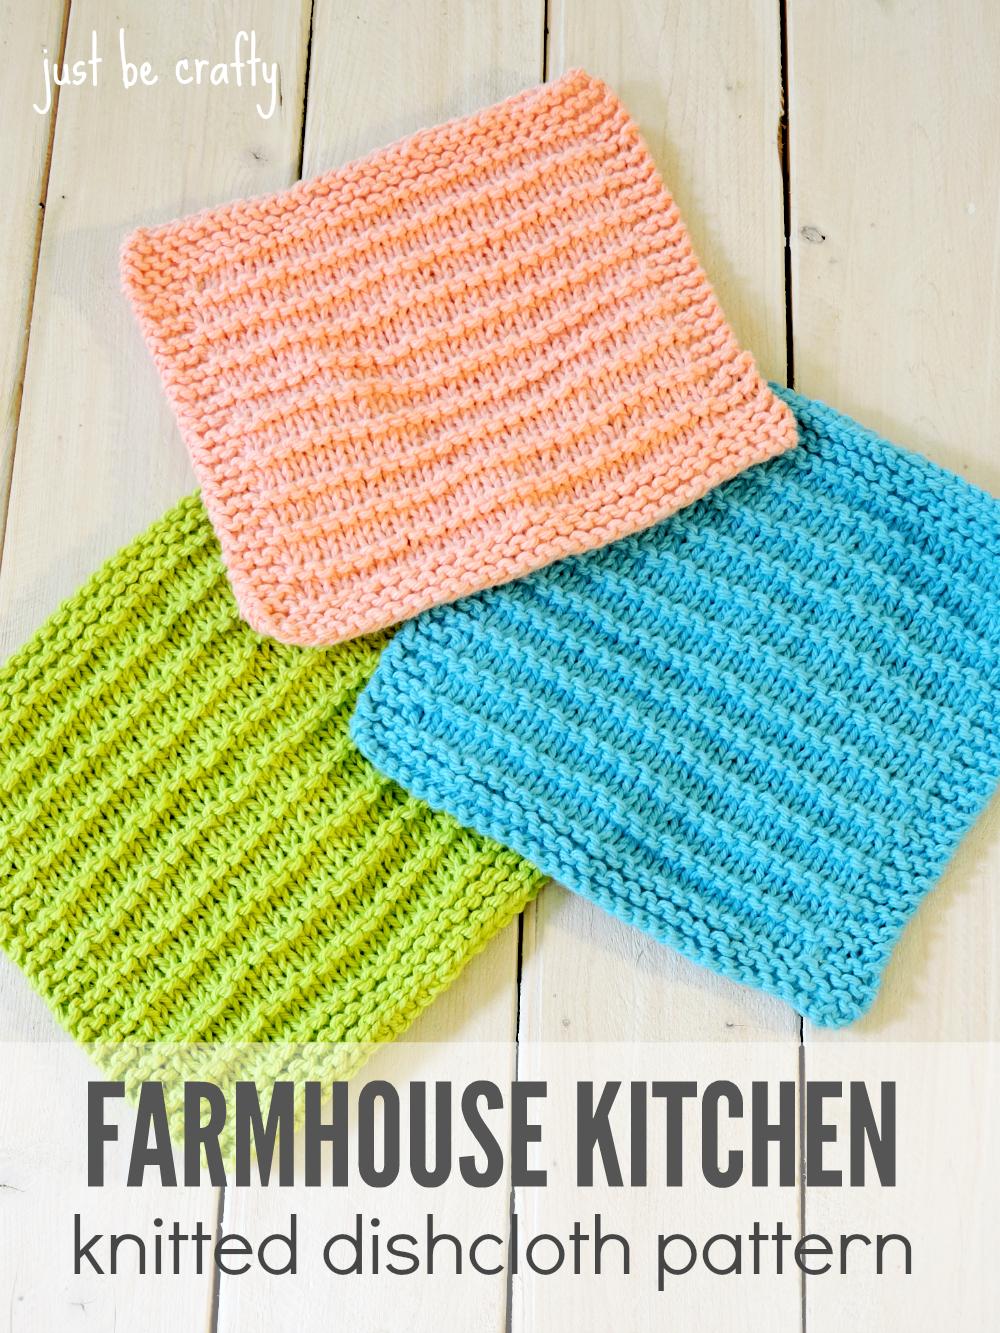 Washcloth Knitting Pattern Free Farmhouse Kitchen Knitted Dishcloths Moogly Community Board